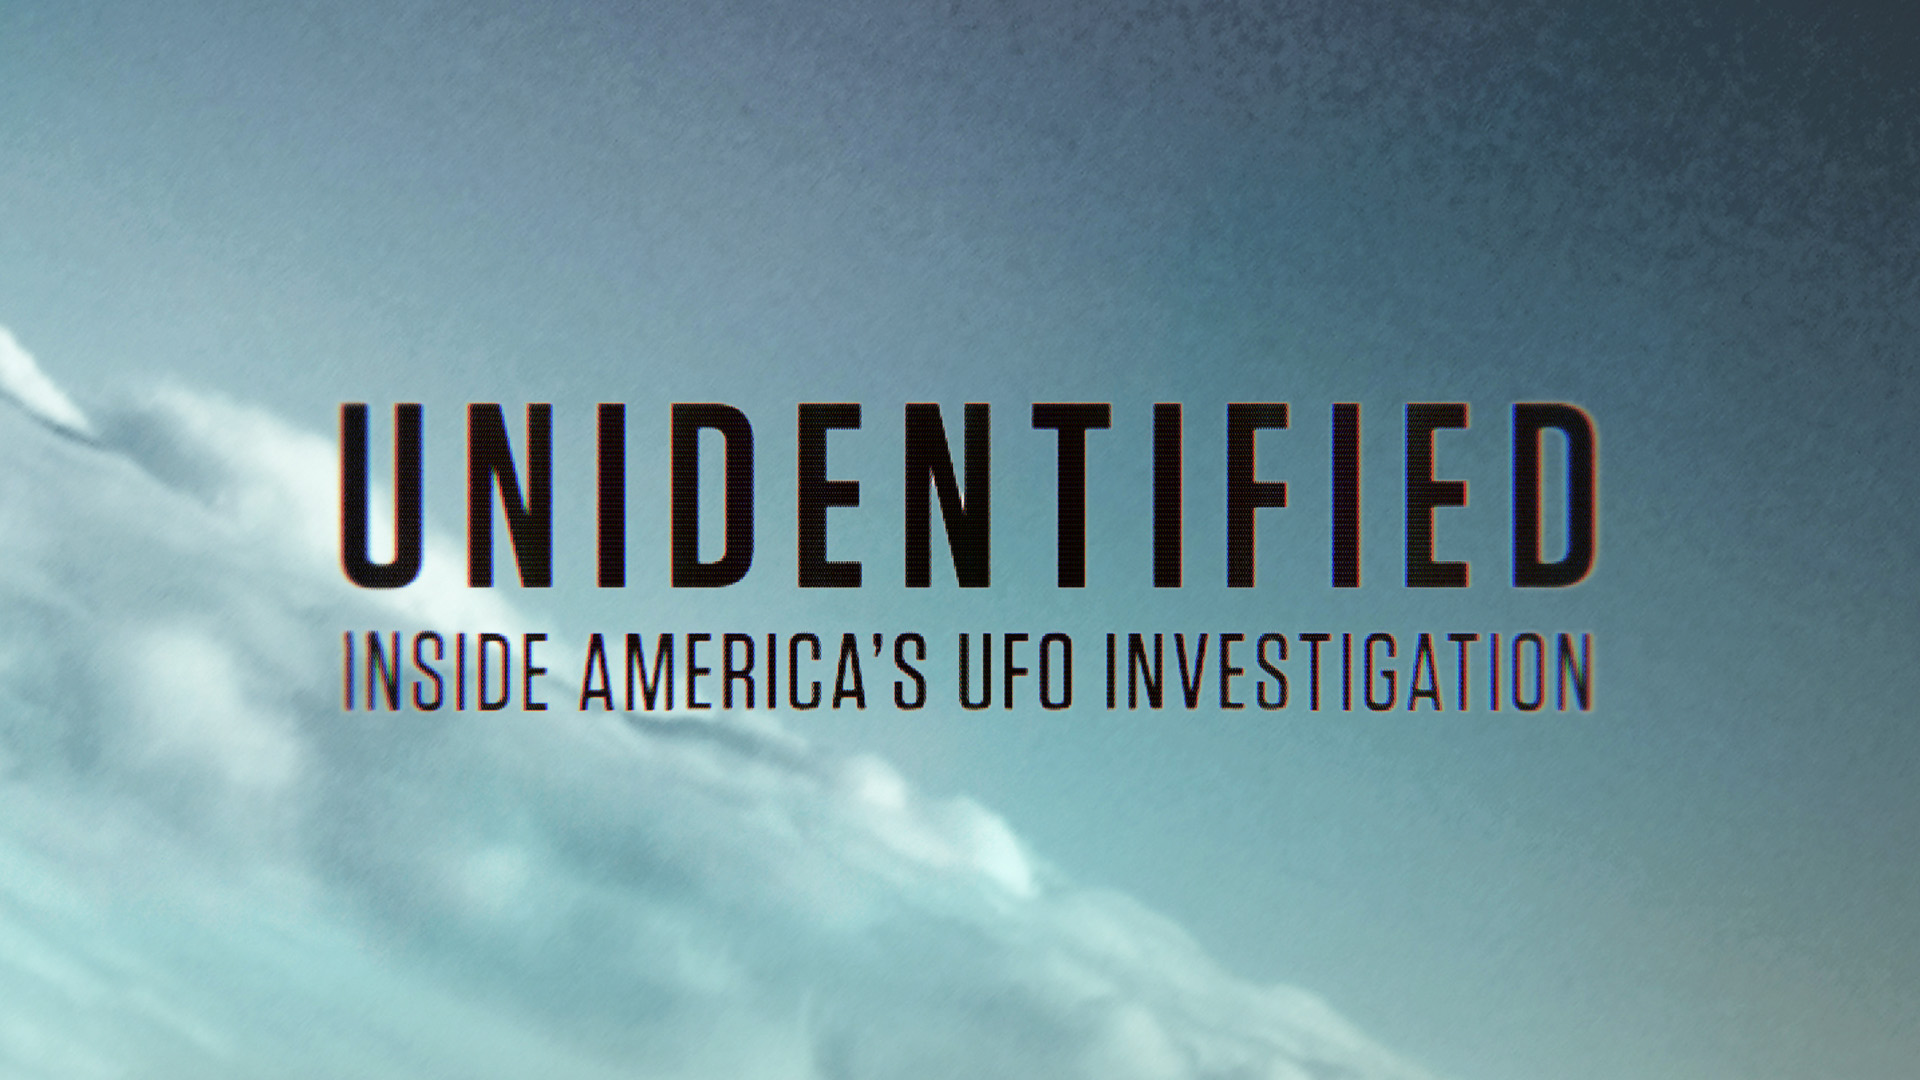 Unidentified: Inside America's UFO Investigation Full